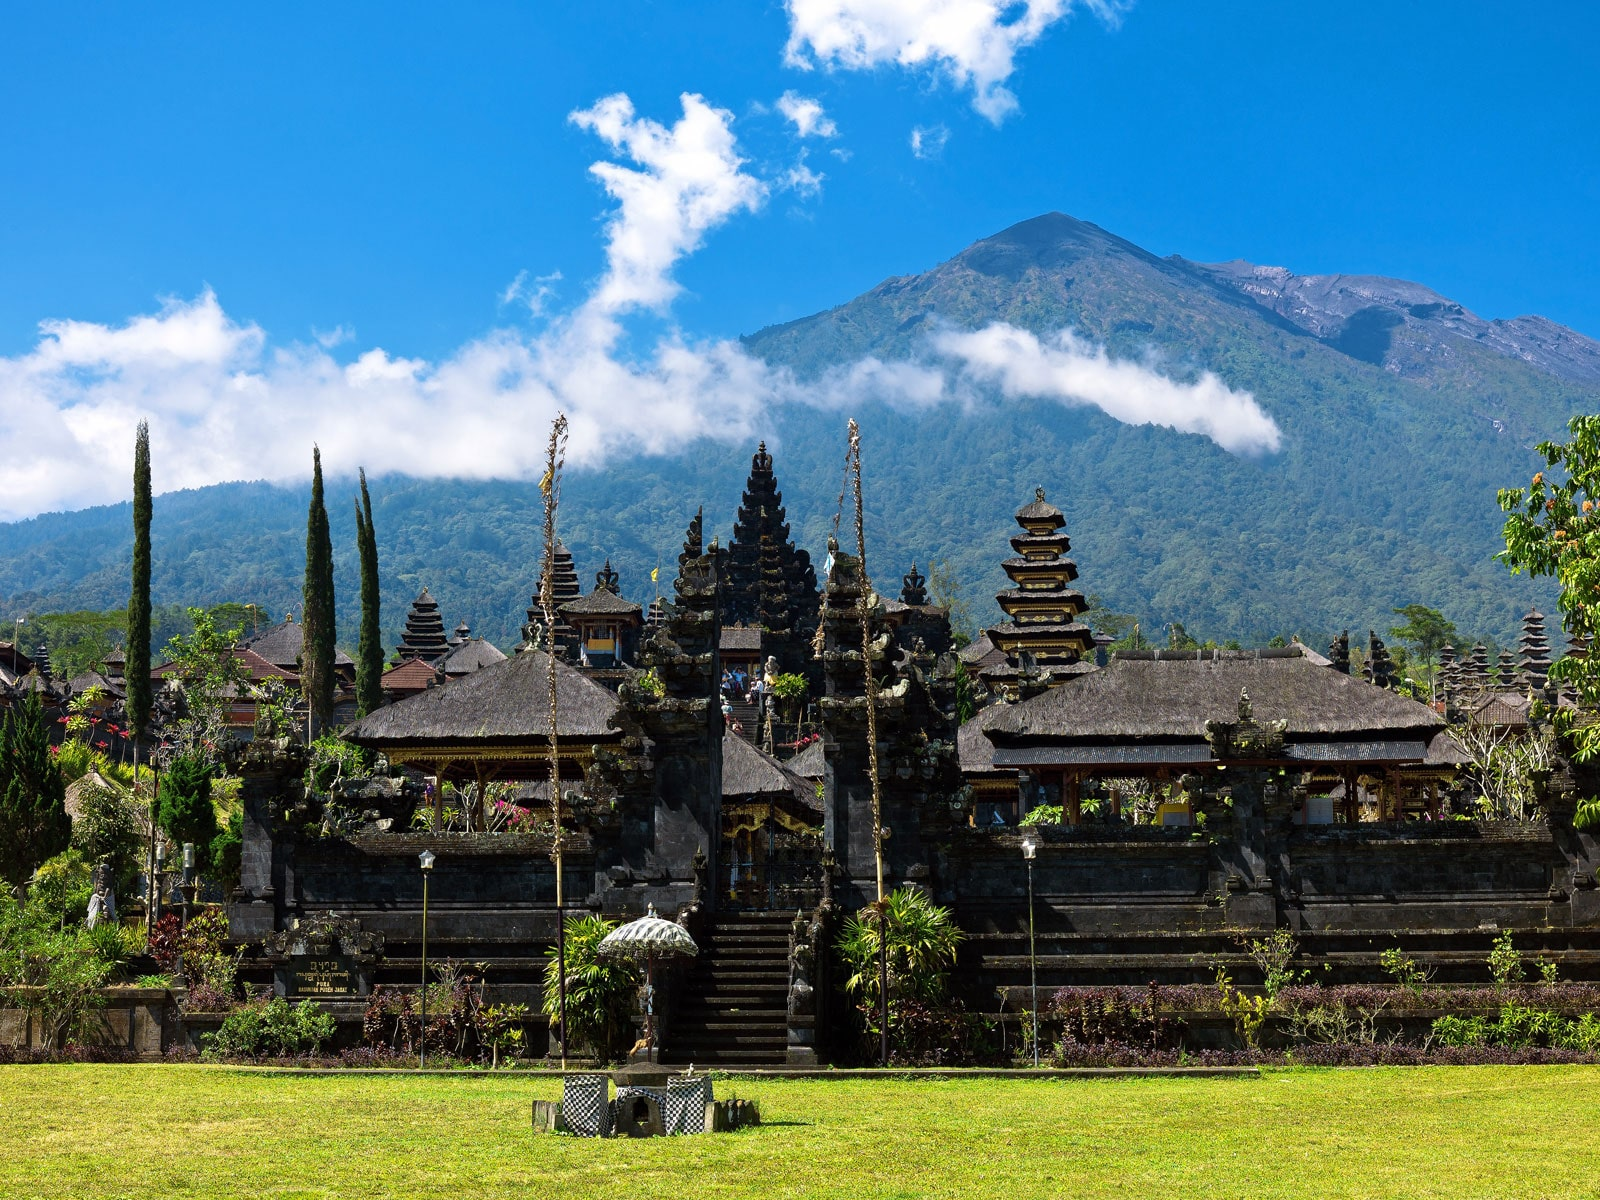 rondreis bali besakih tempel blog